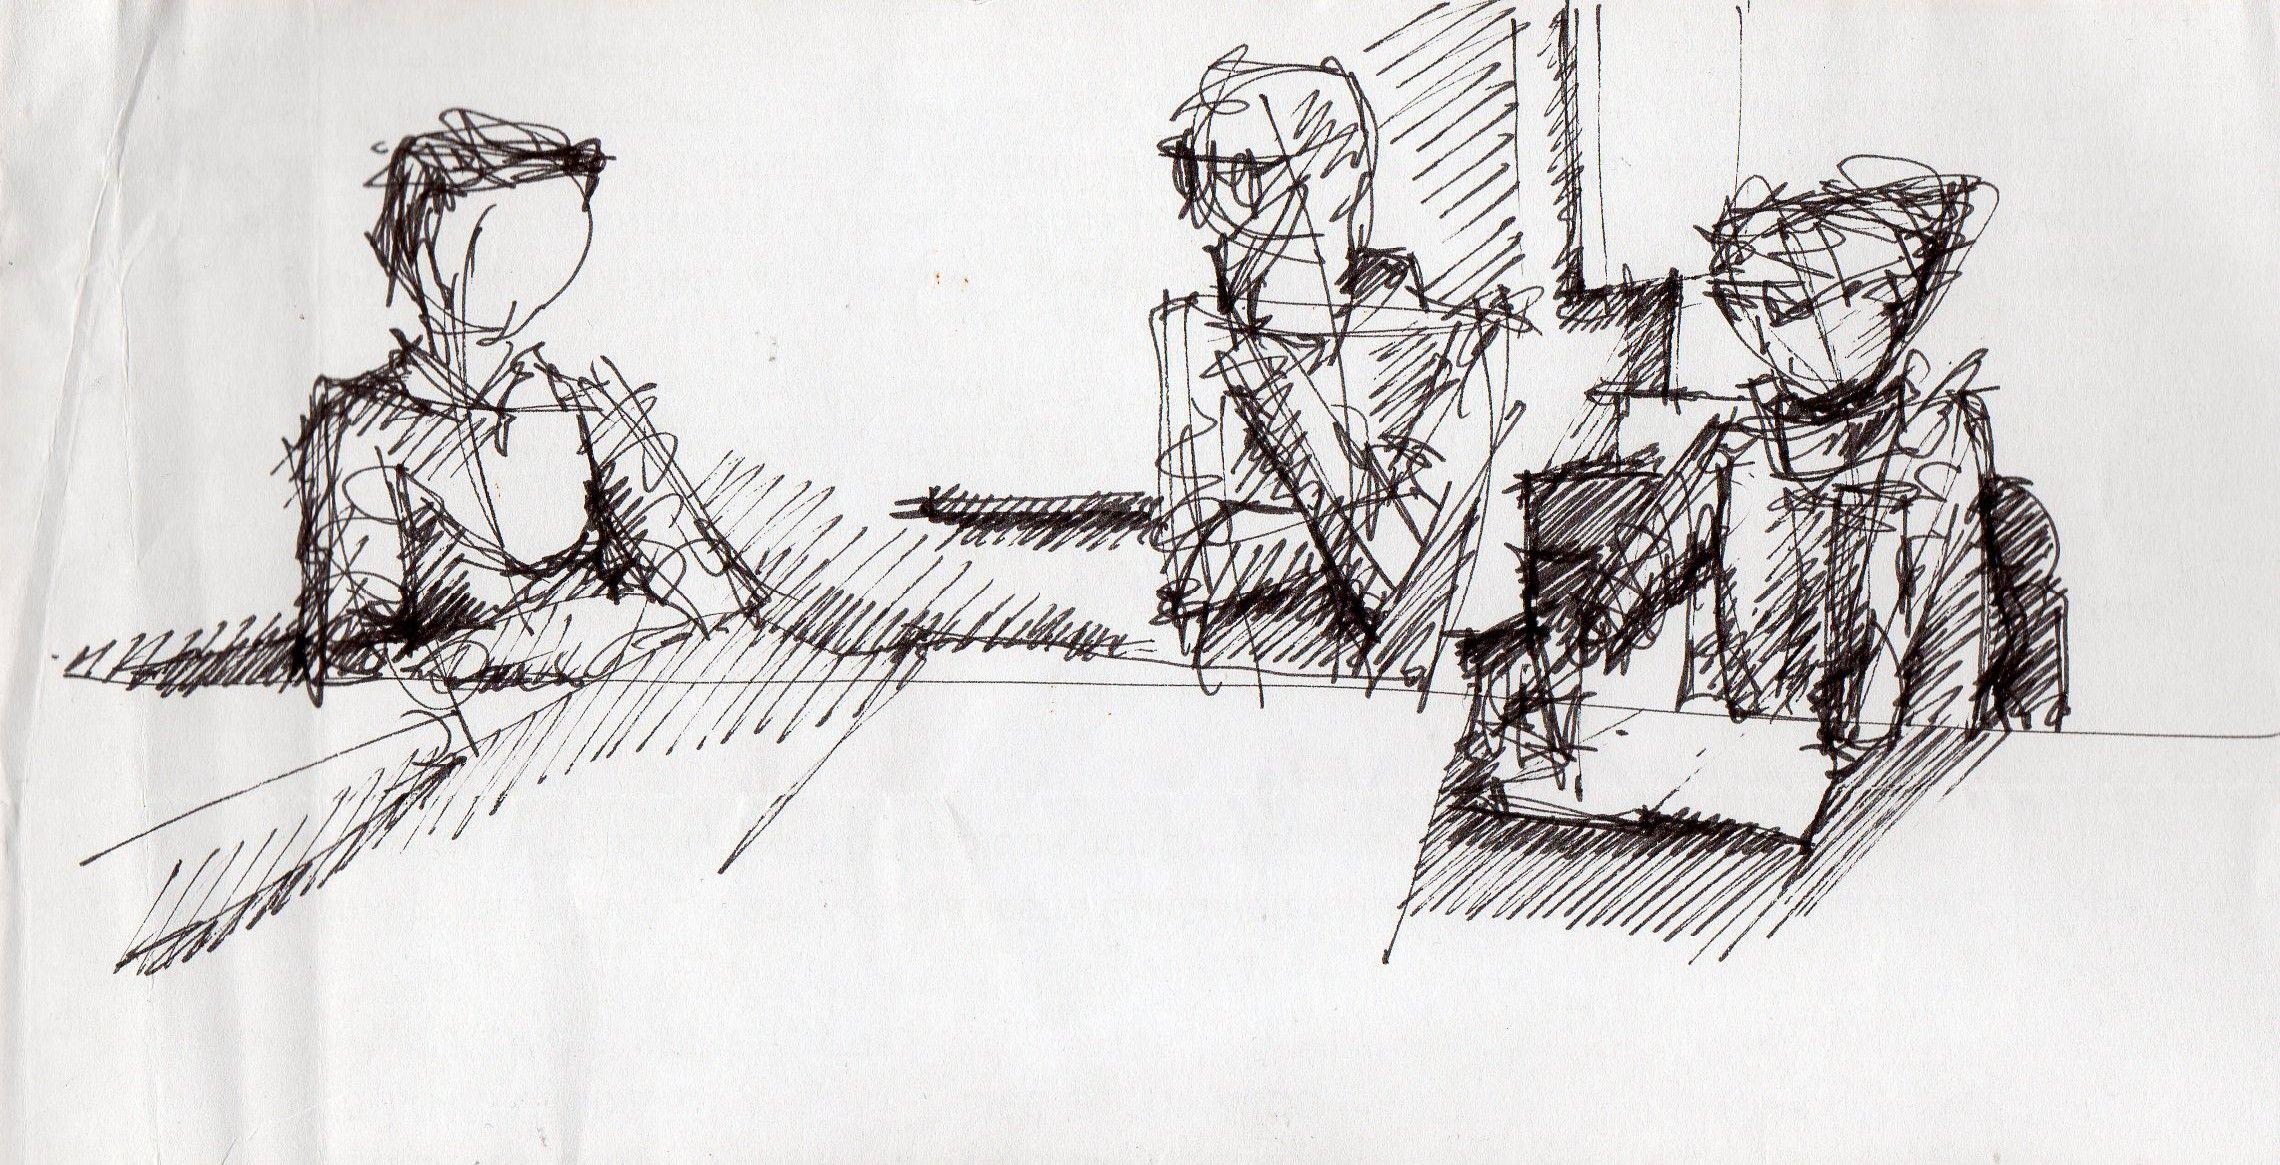 Francesco, Gianpiero e Graziella a Matera #inkpen #Matera #architecture #working #drawing